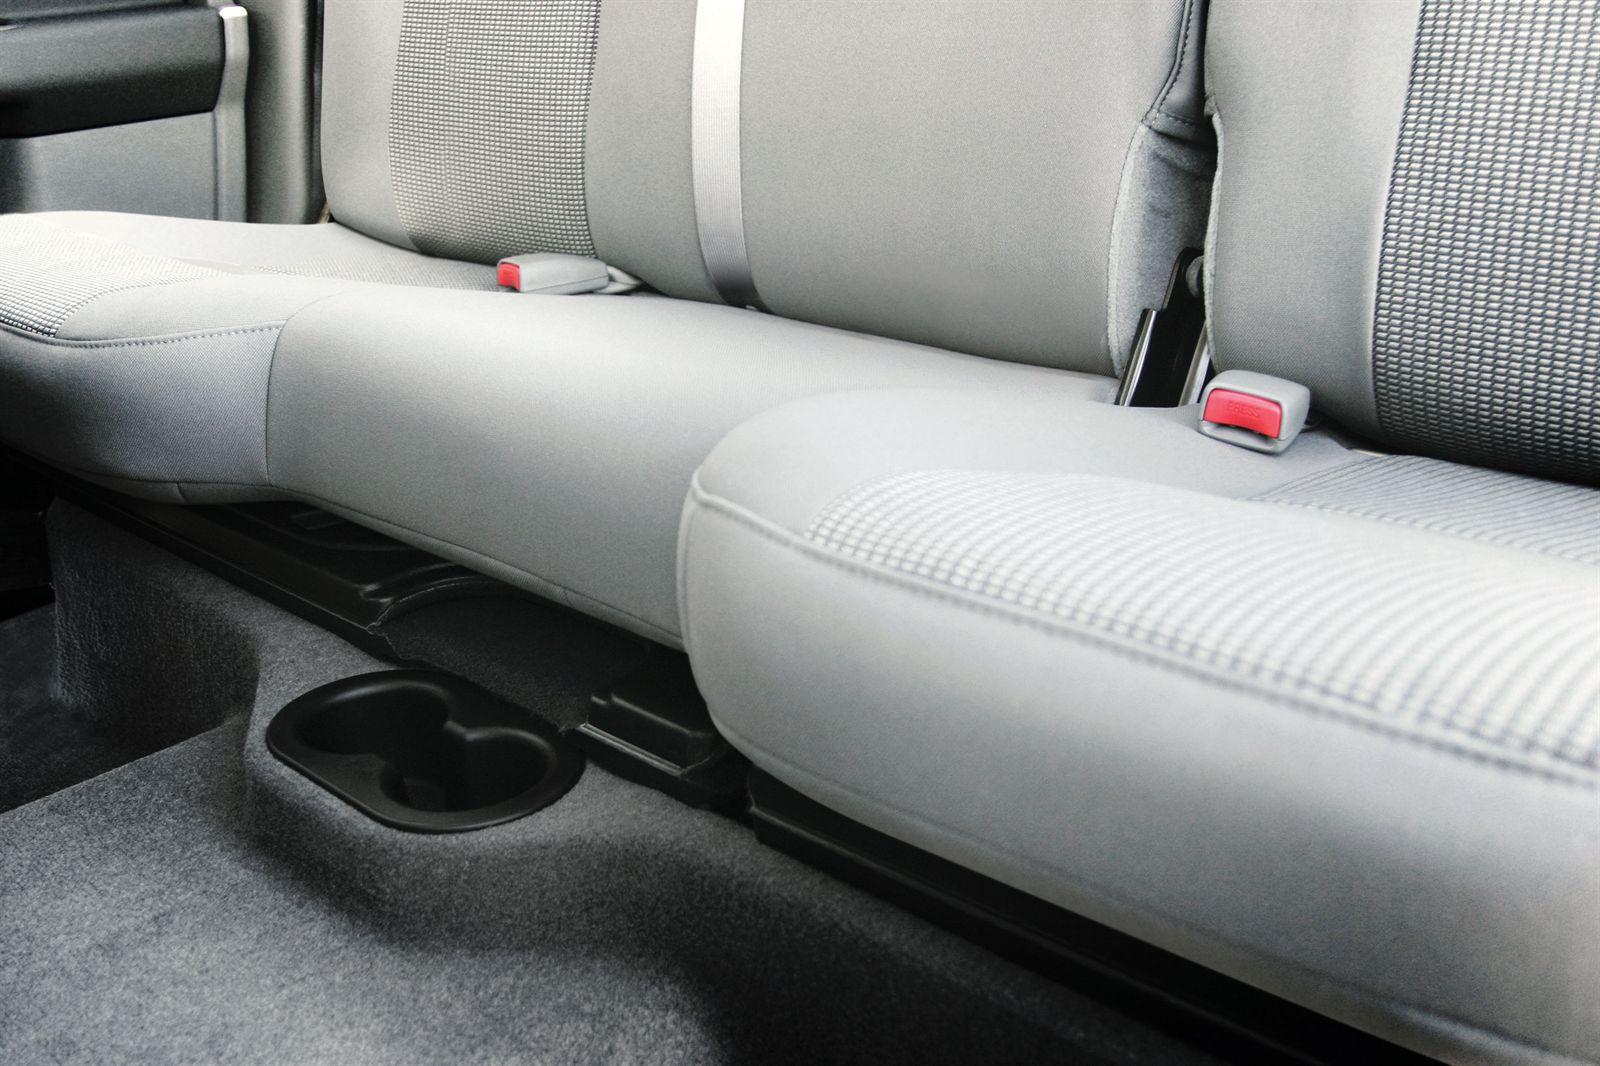 2002 Dodge Ram 1500 Accessories >> DRQC20T-TN Thunderform Loaded Subwoofer Enclosure Dodge Ram Quad Cab 2002-2016 - Tan   MTX Audio ...